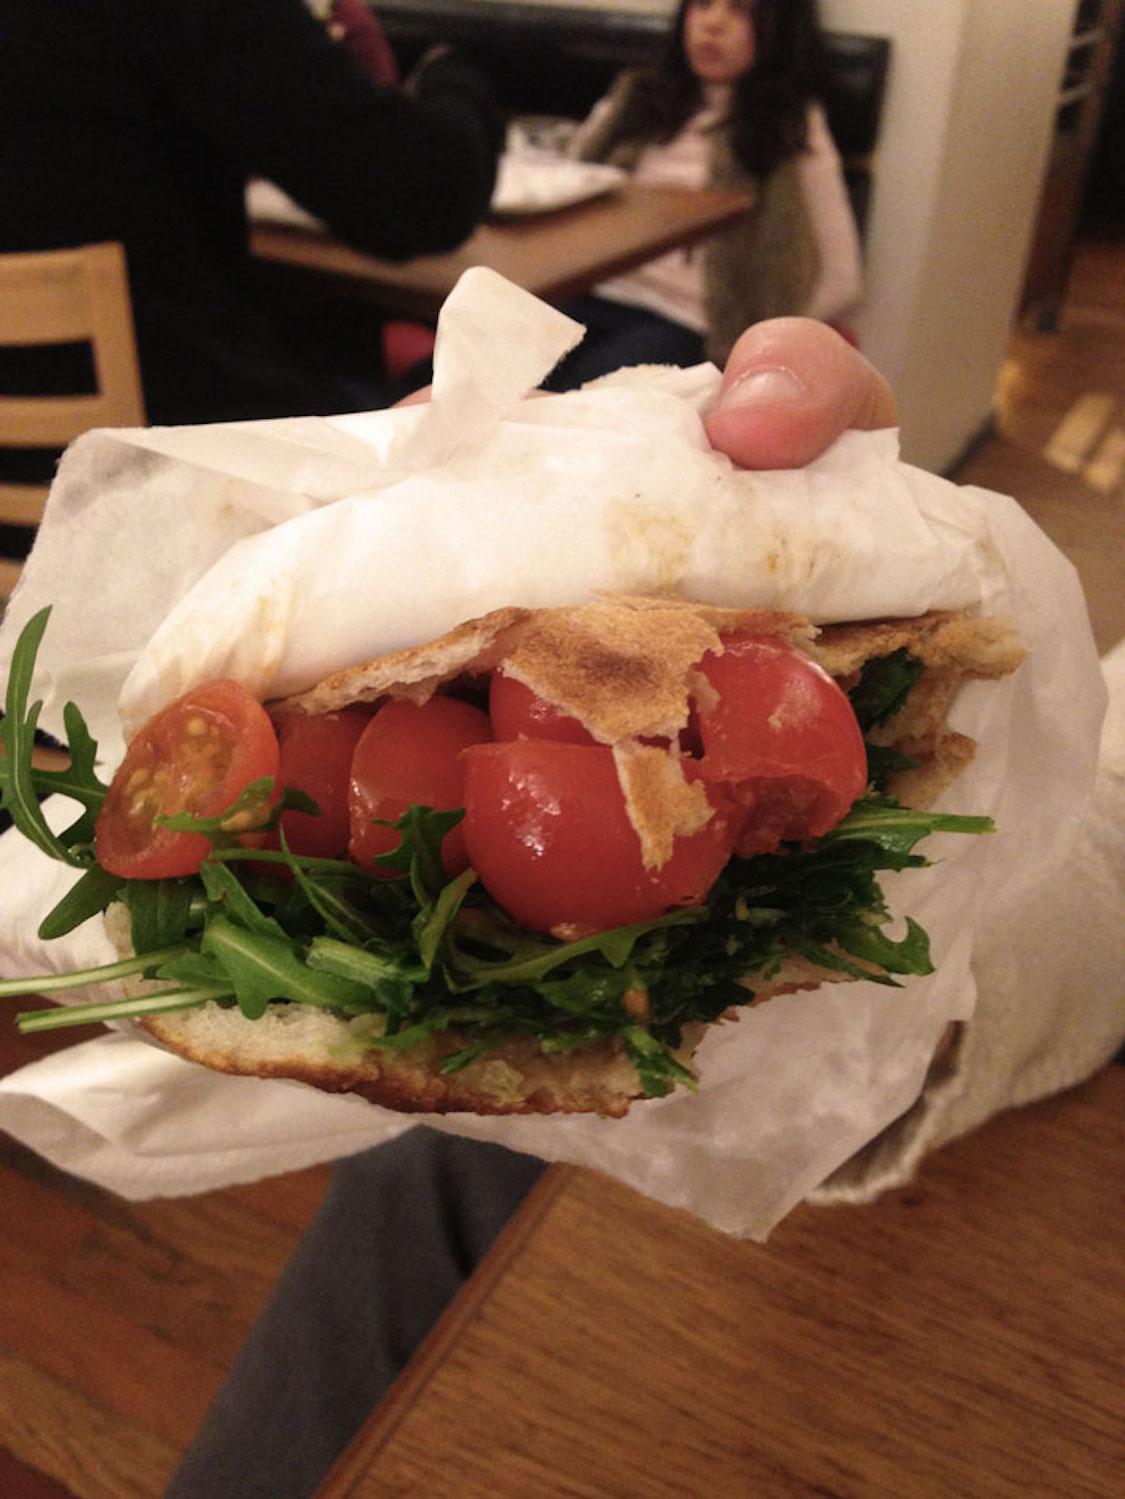 cosi-o-restaurante-simples-de-paris-sanduiches-e-saladas-danielle-noce-4